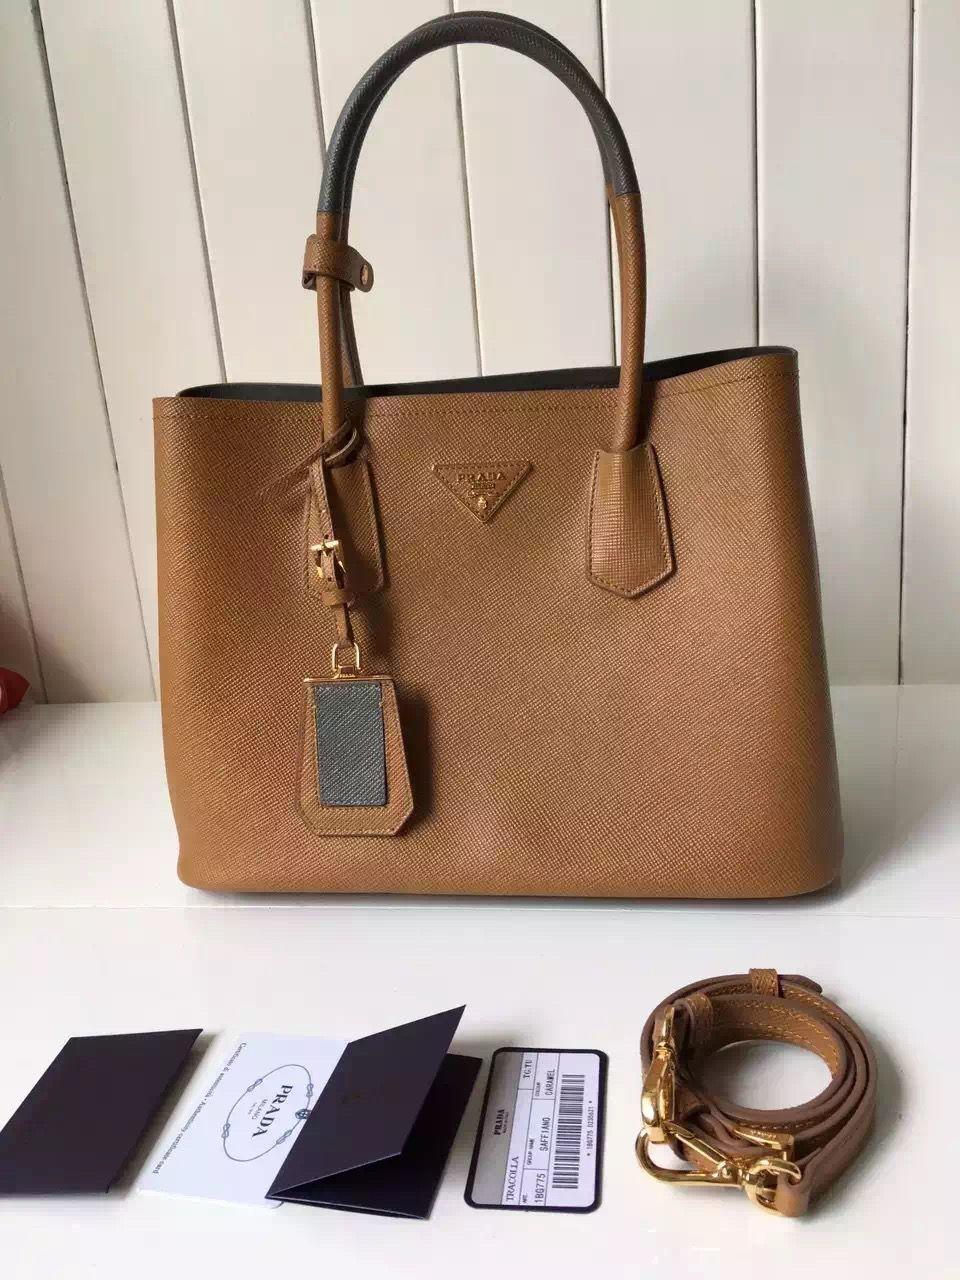 2676147bb5ecfa Prada Saffiano Leather Double Bag with Two-tone Handle Caramel/Marble 2016